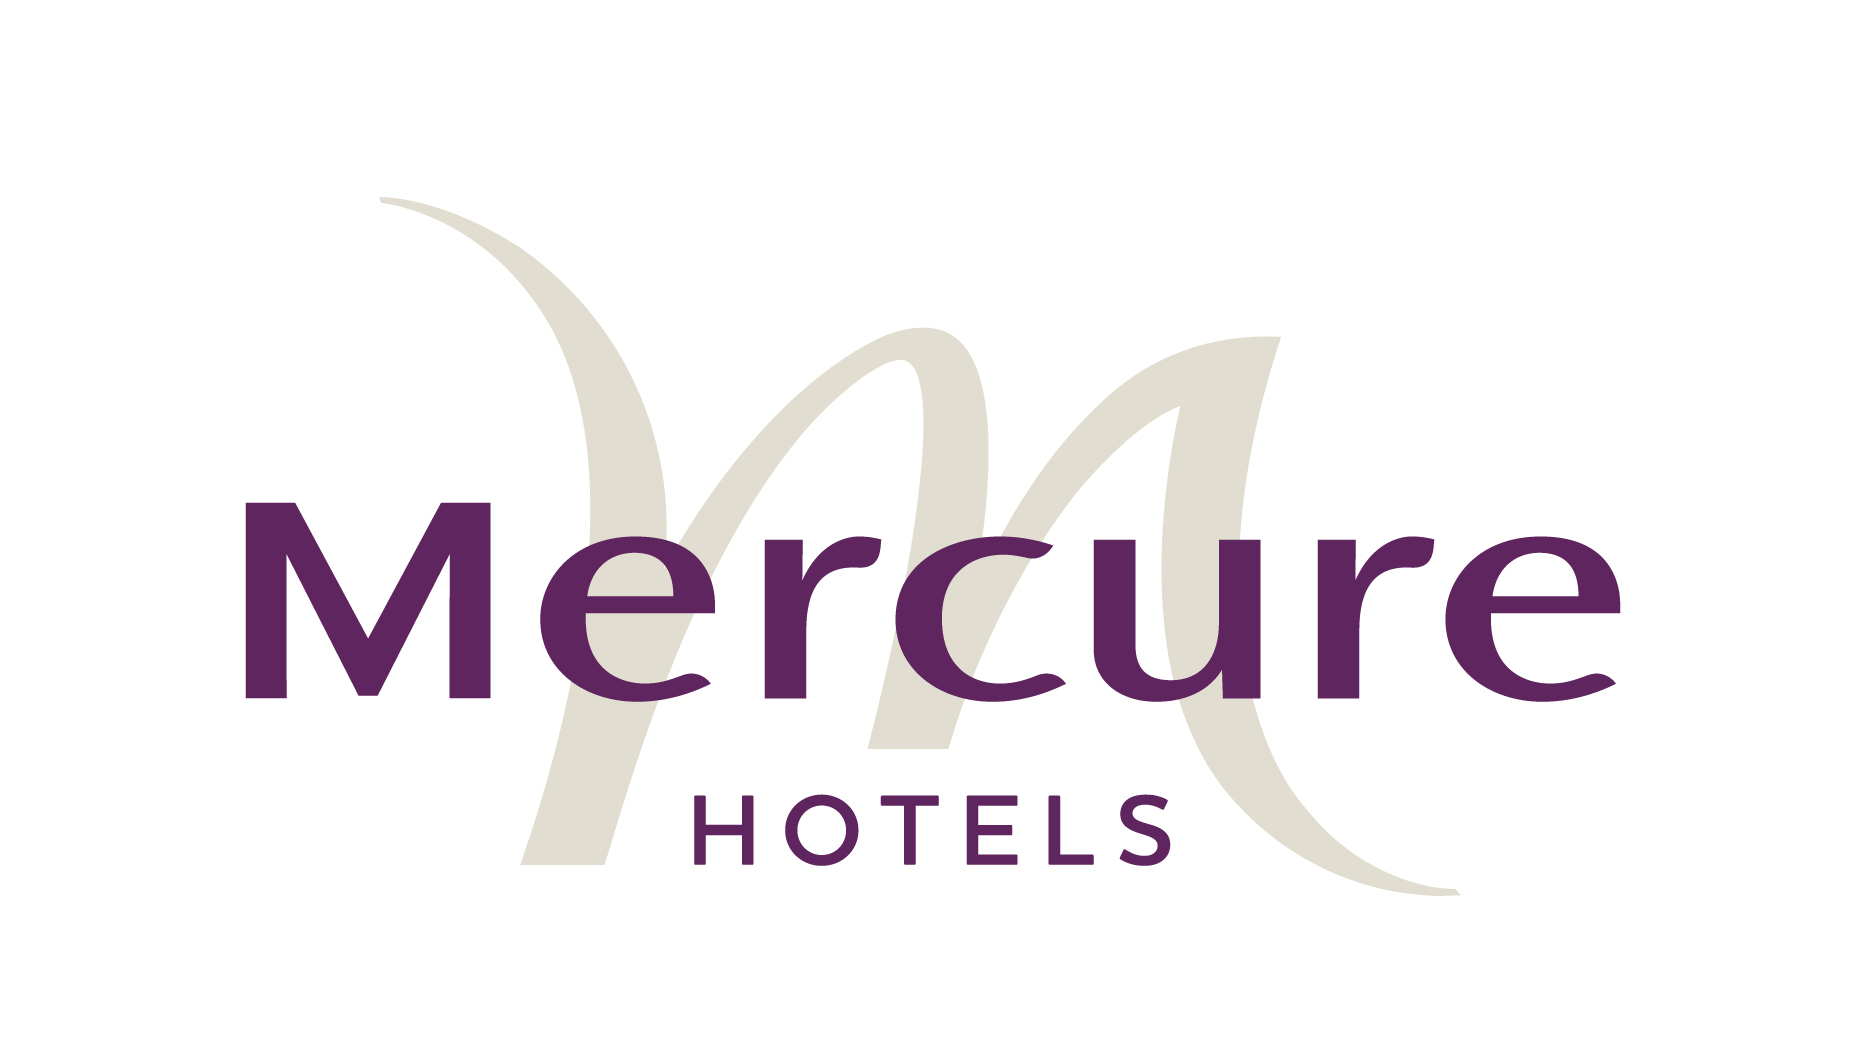 Comment contacter MERCURE?